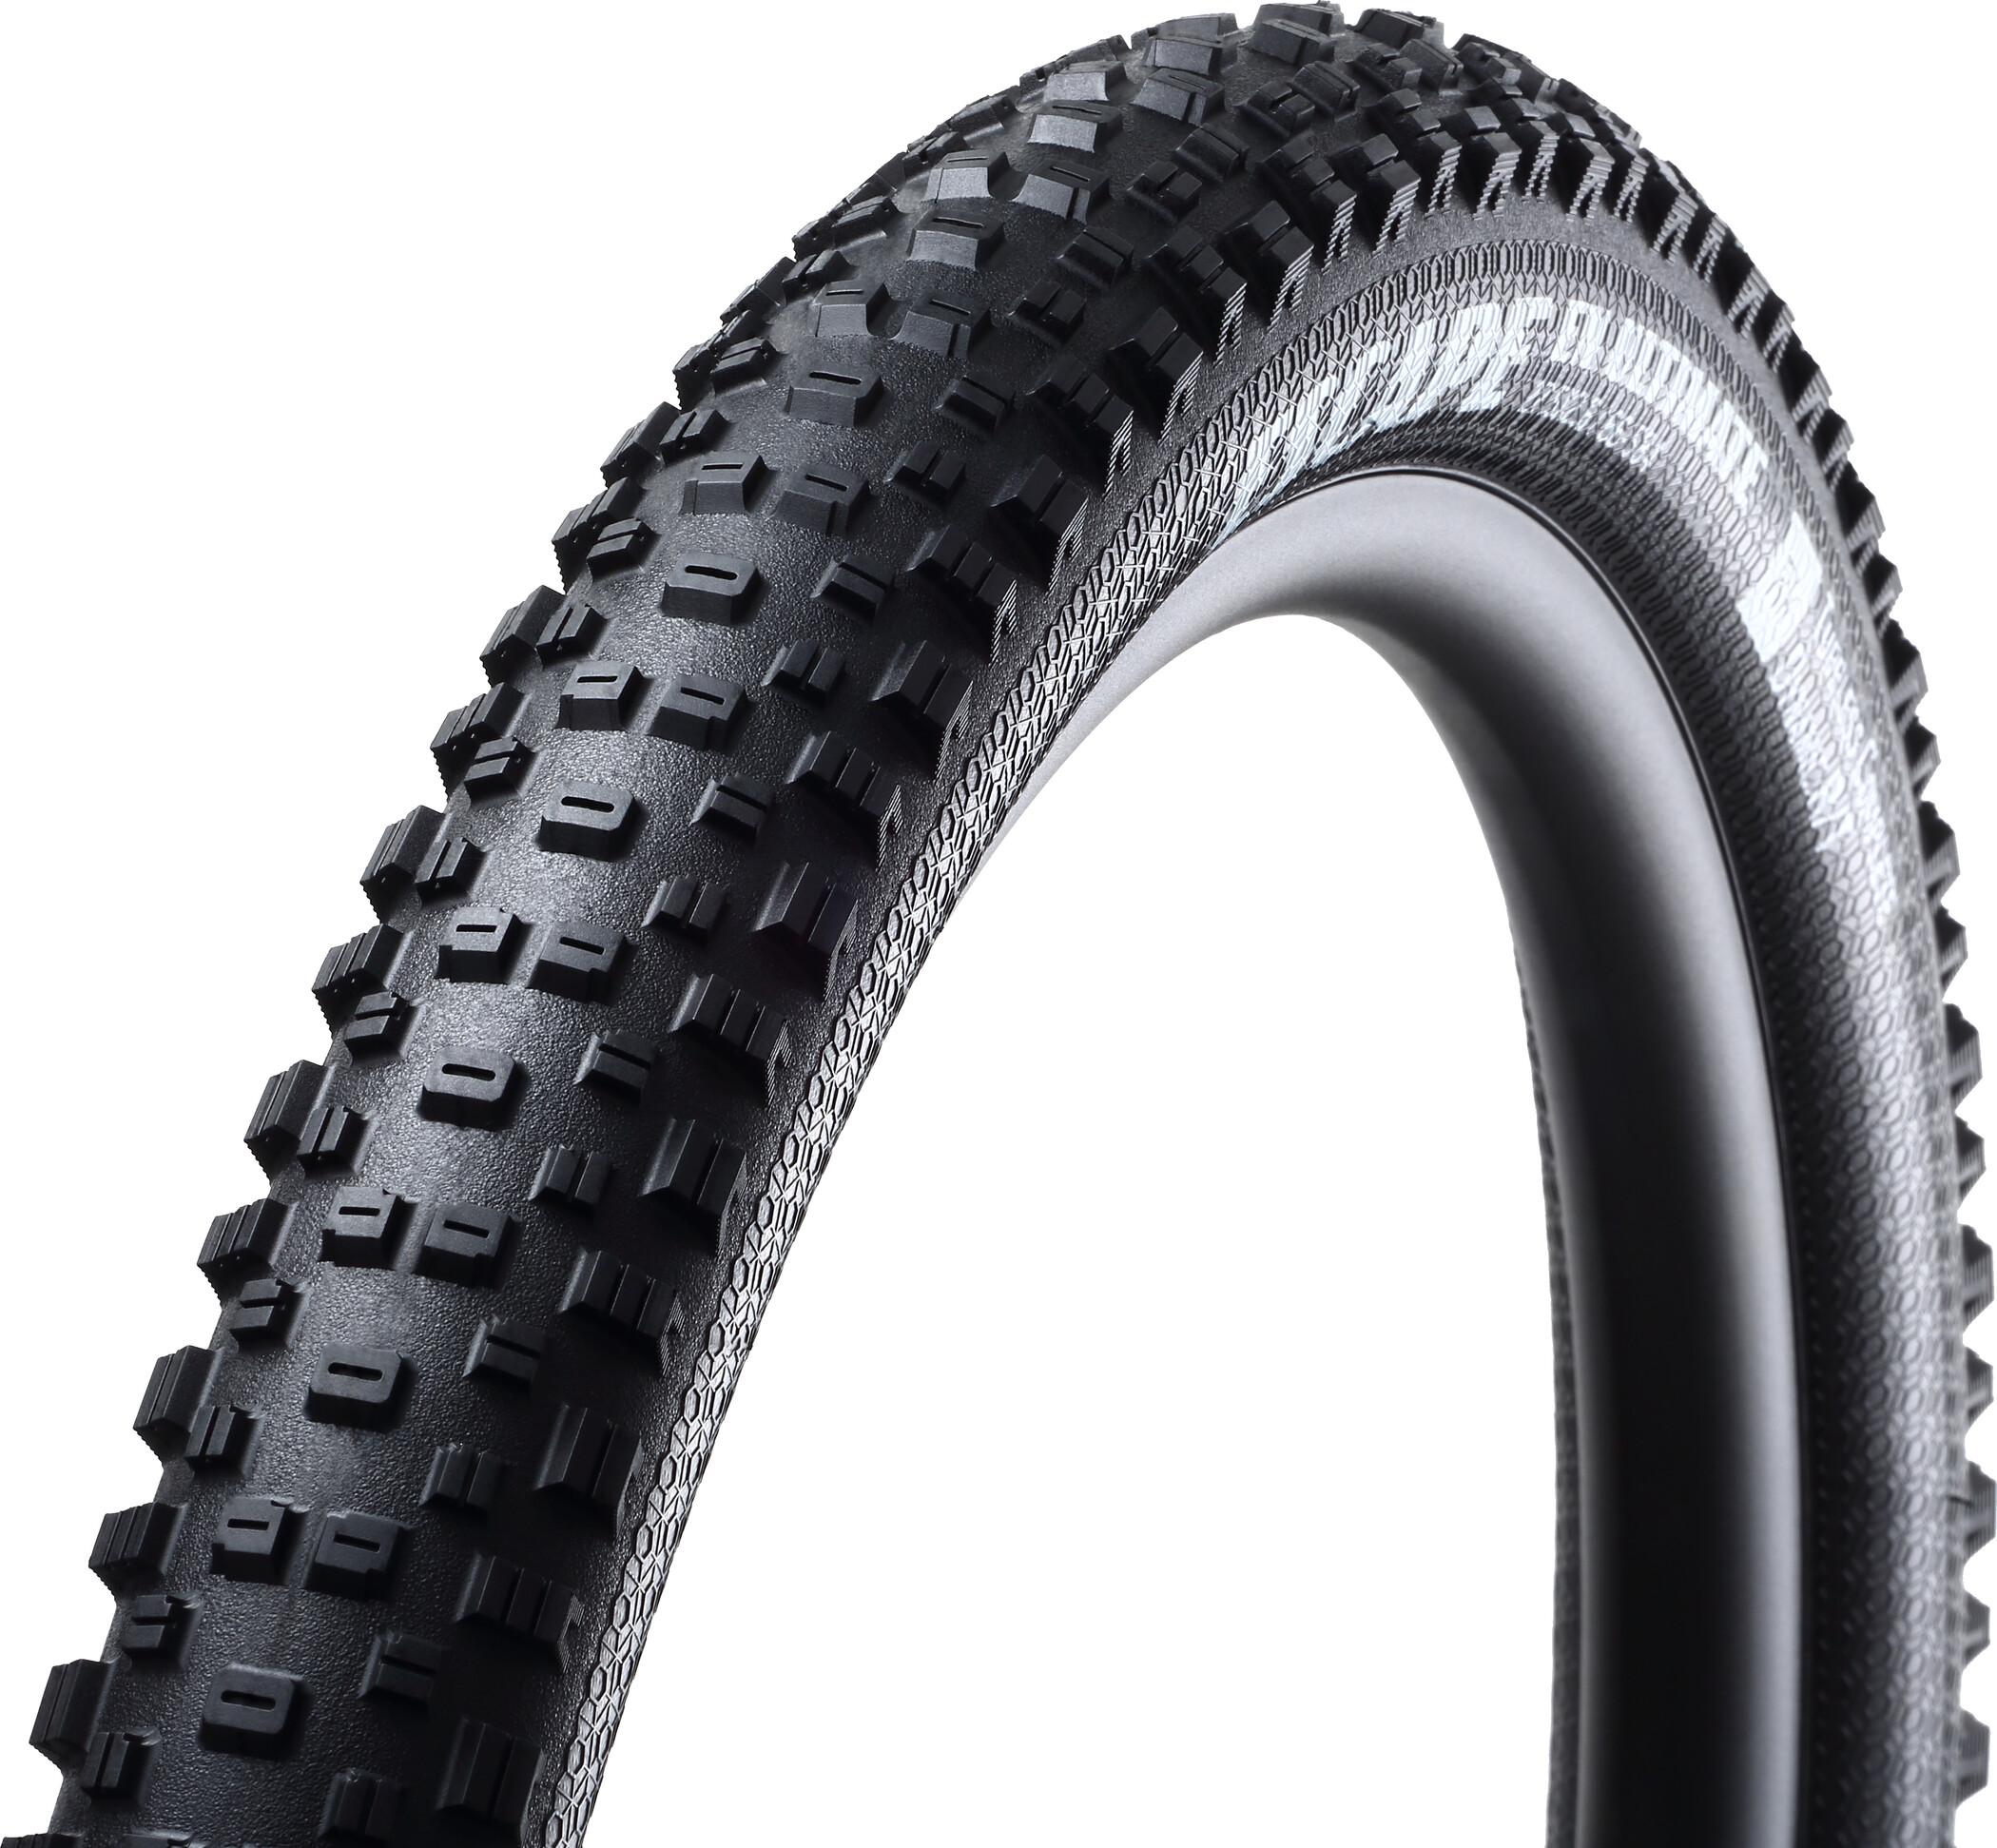 Goodyear Escape EN Premium Foldedæk 66-622 Tubeless Complete Dynamic R/T e25, black (2019)   Tyres